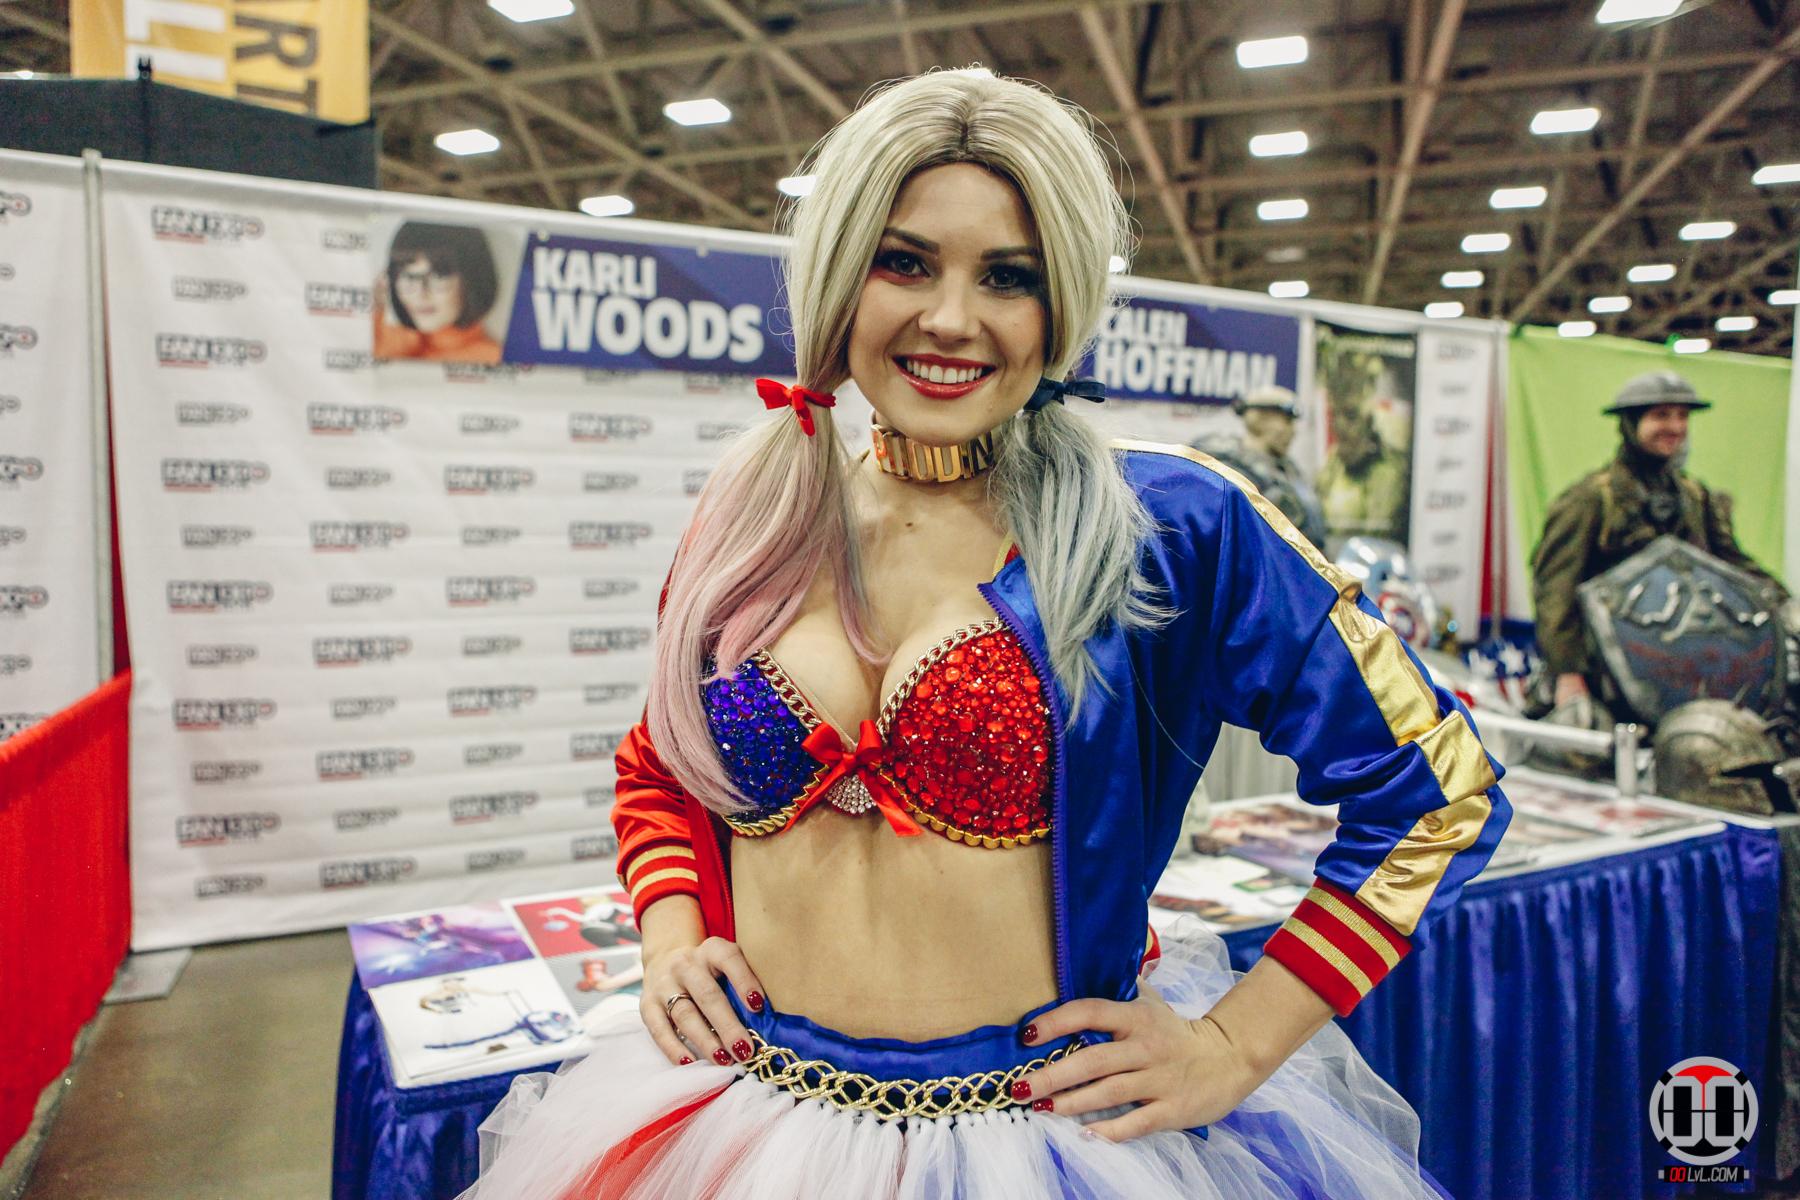 Fan-Expo-Dallas-17-2-36